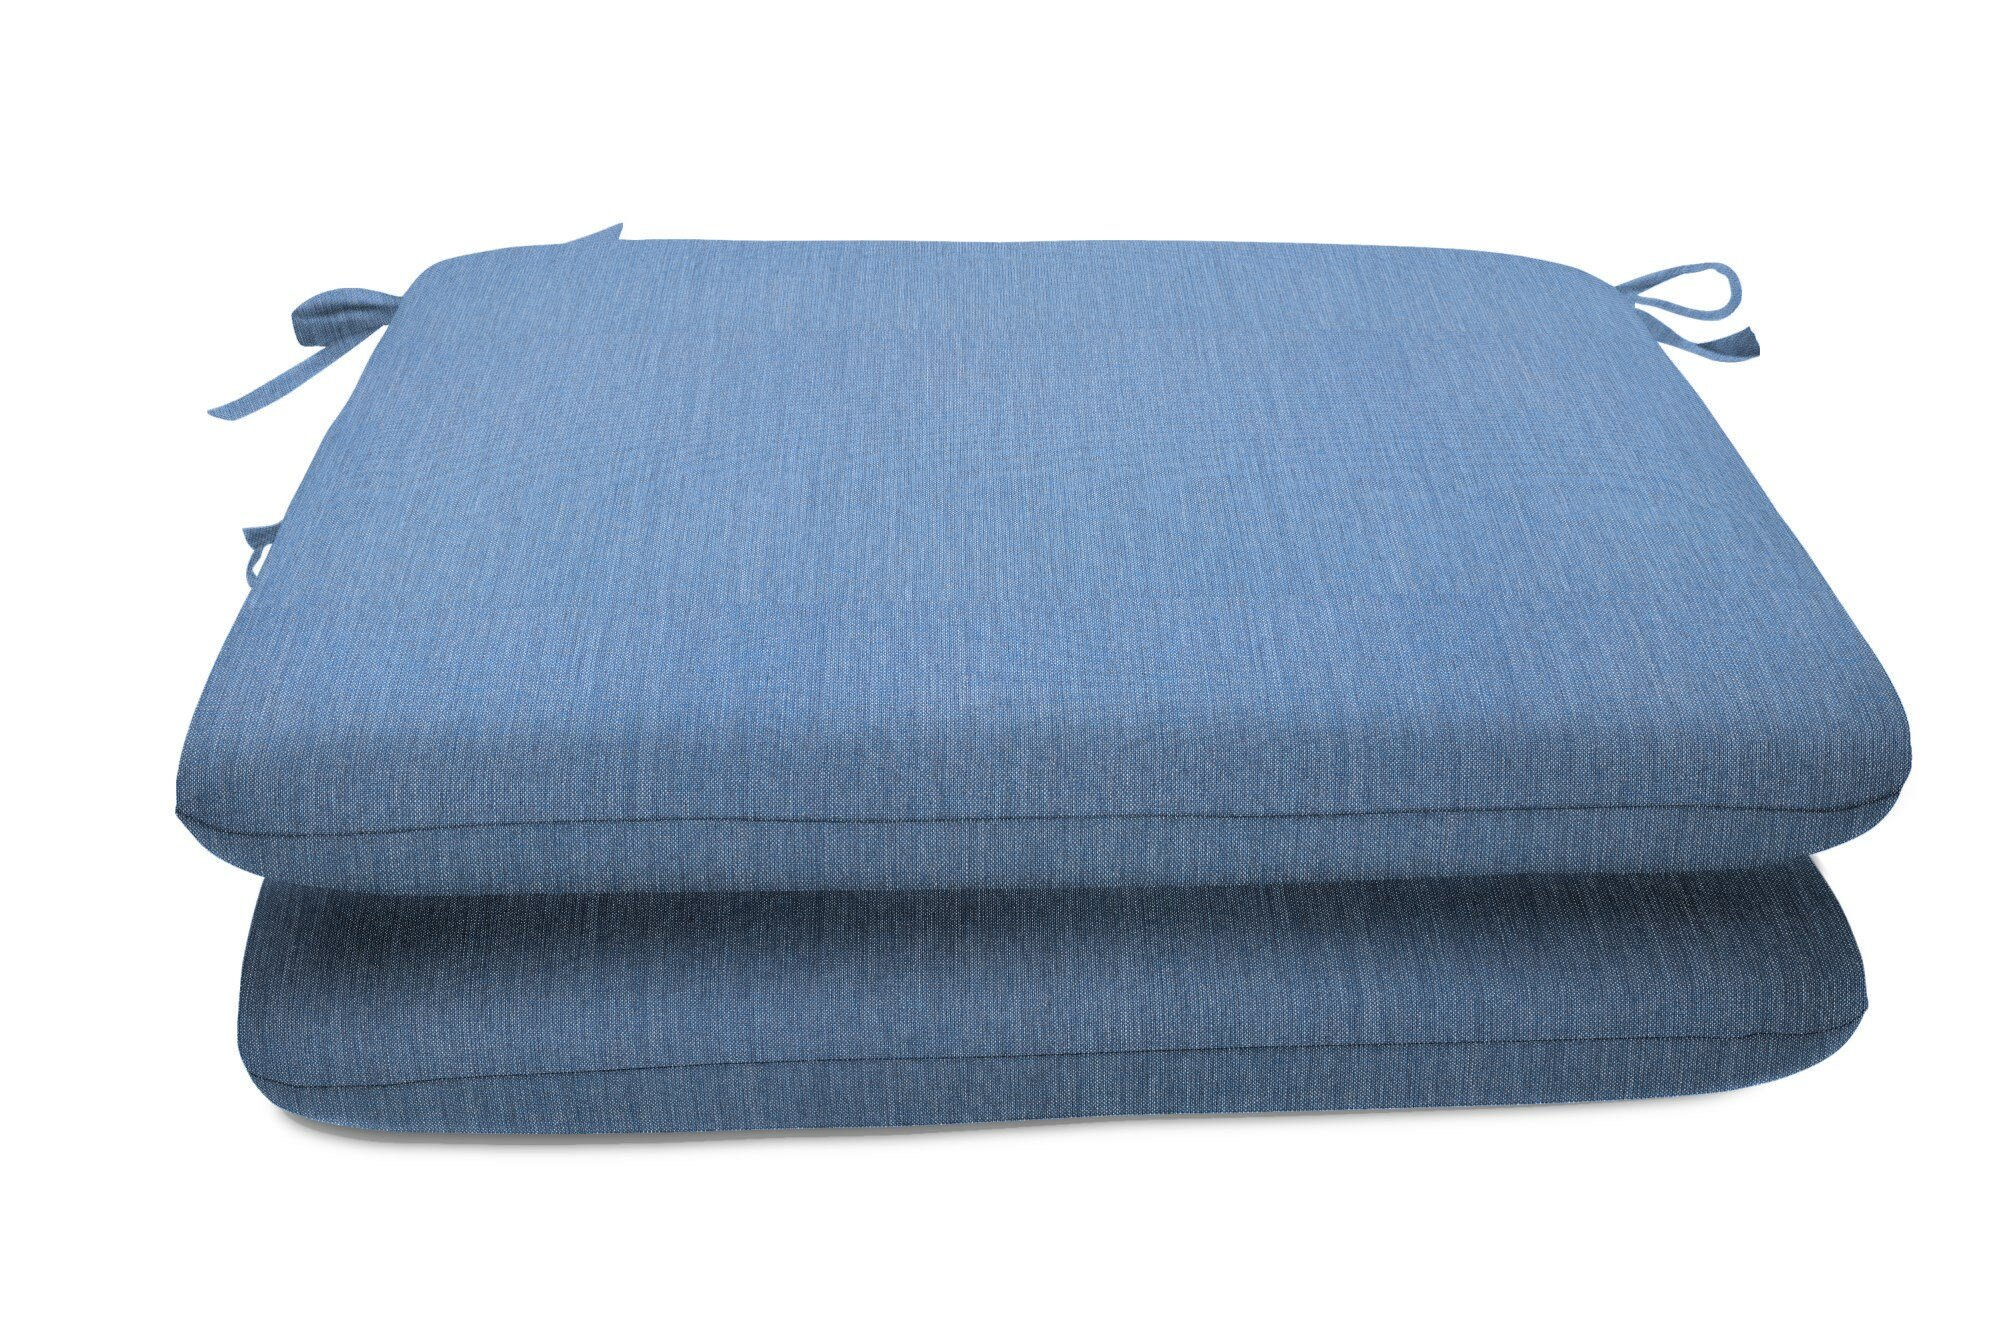 Wildon Home Outdoor Sunbrella Seat Cushion Reviews Wayfair